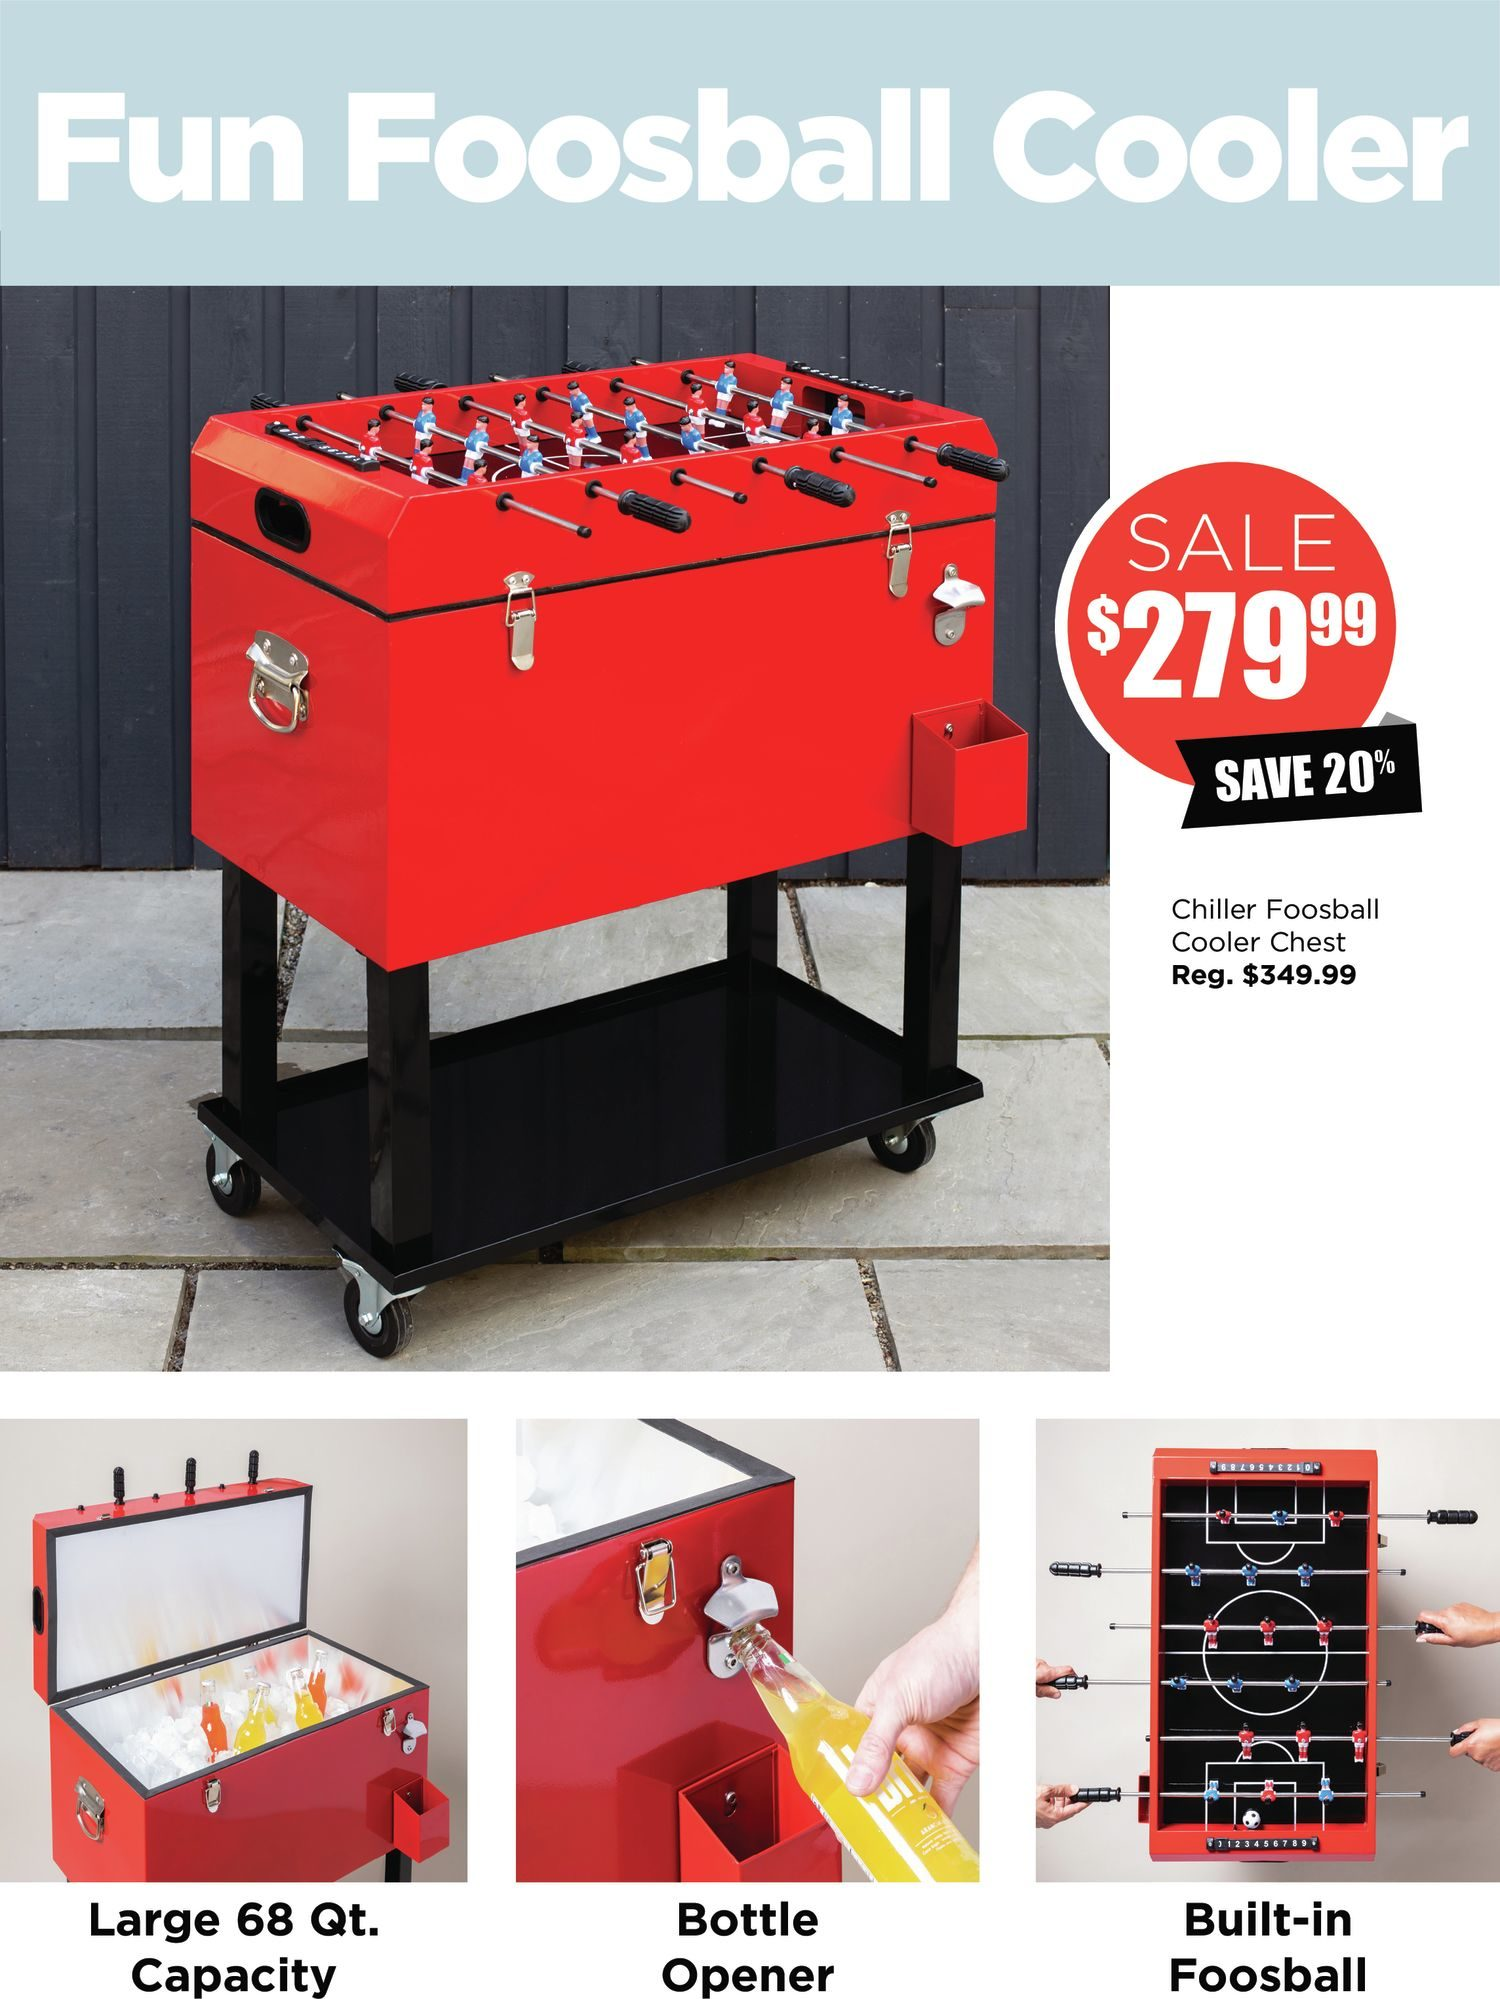 Kitchen Stuff Plus - Outdoor Entertaining Event - Page 11